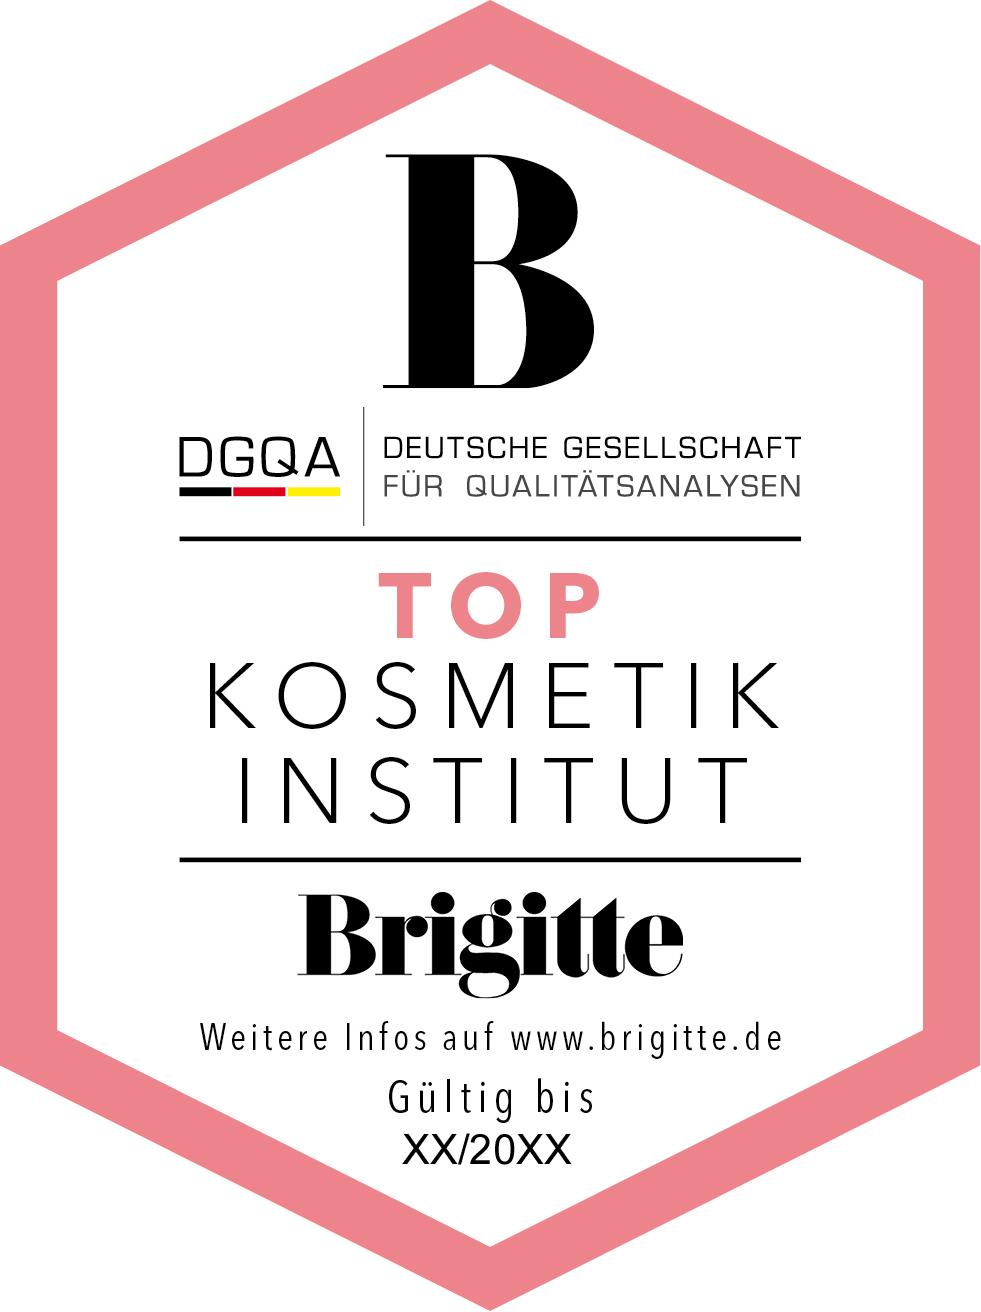 dgqa brigitte top kosmetikinstitut label